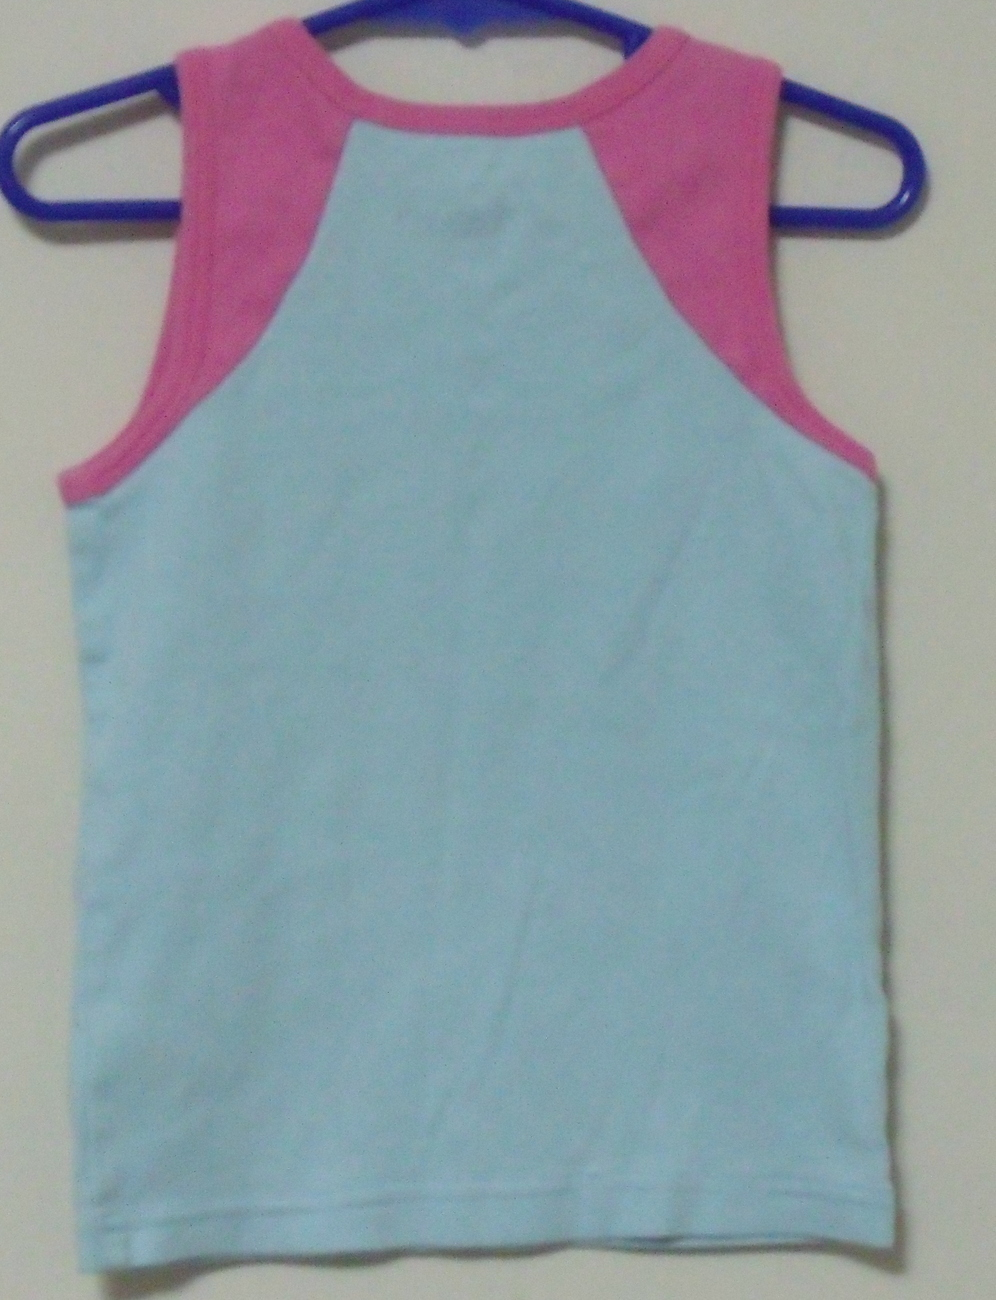 Girls Carters Blue Pink Sleeveless Top Size 5